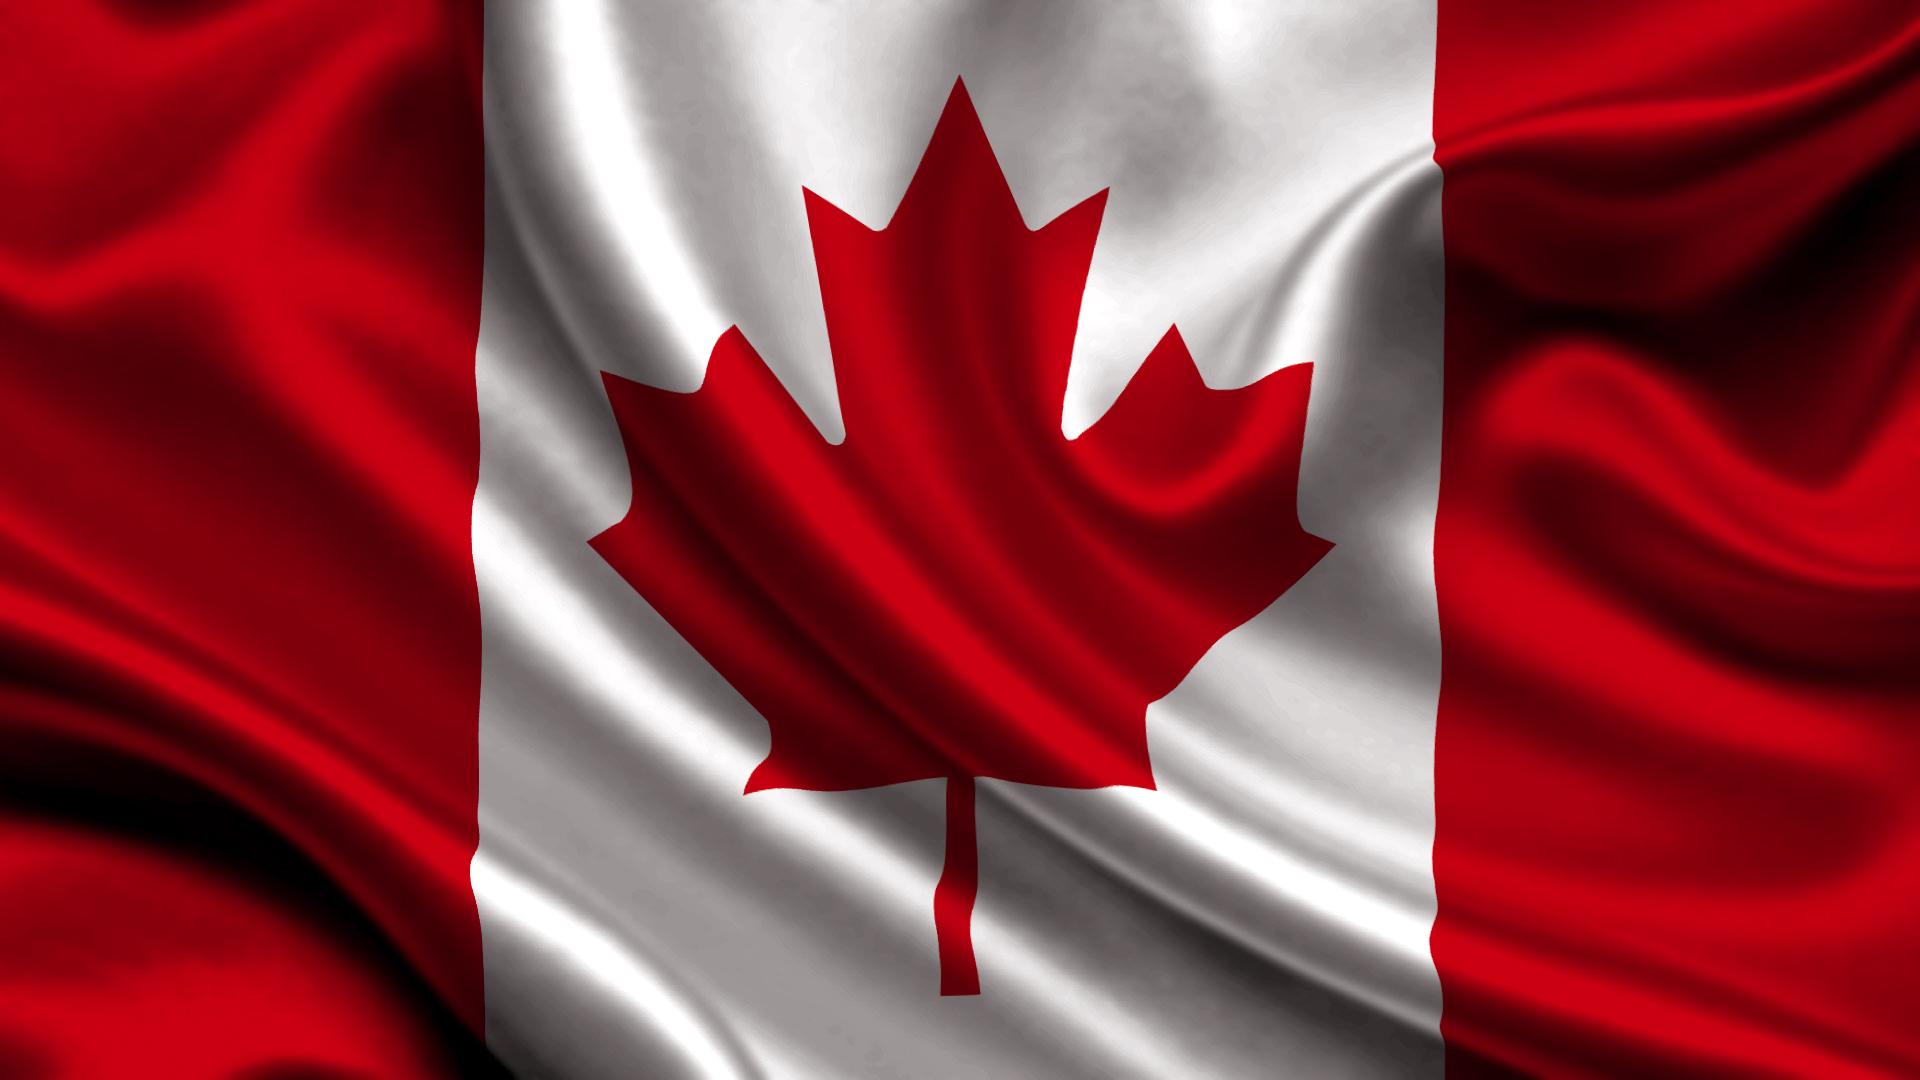 canada-flag-wallpaper-6070-6408-hd-wallpapers.jpg